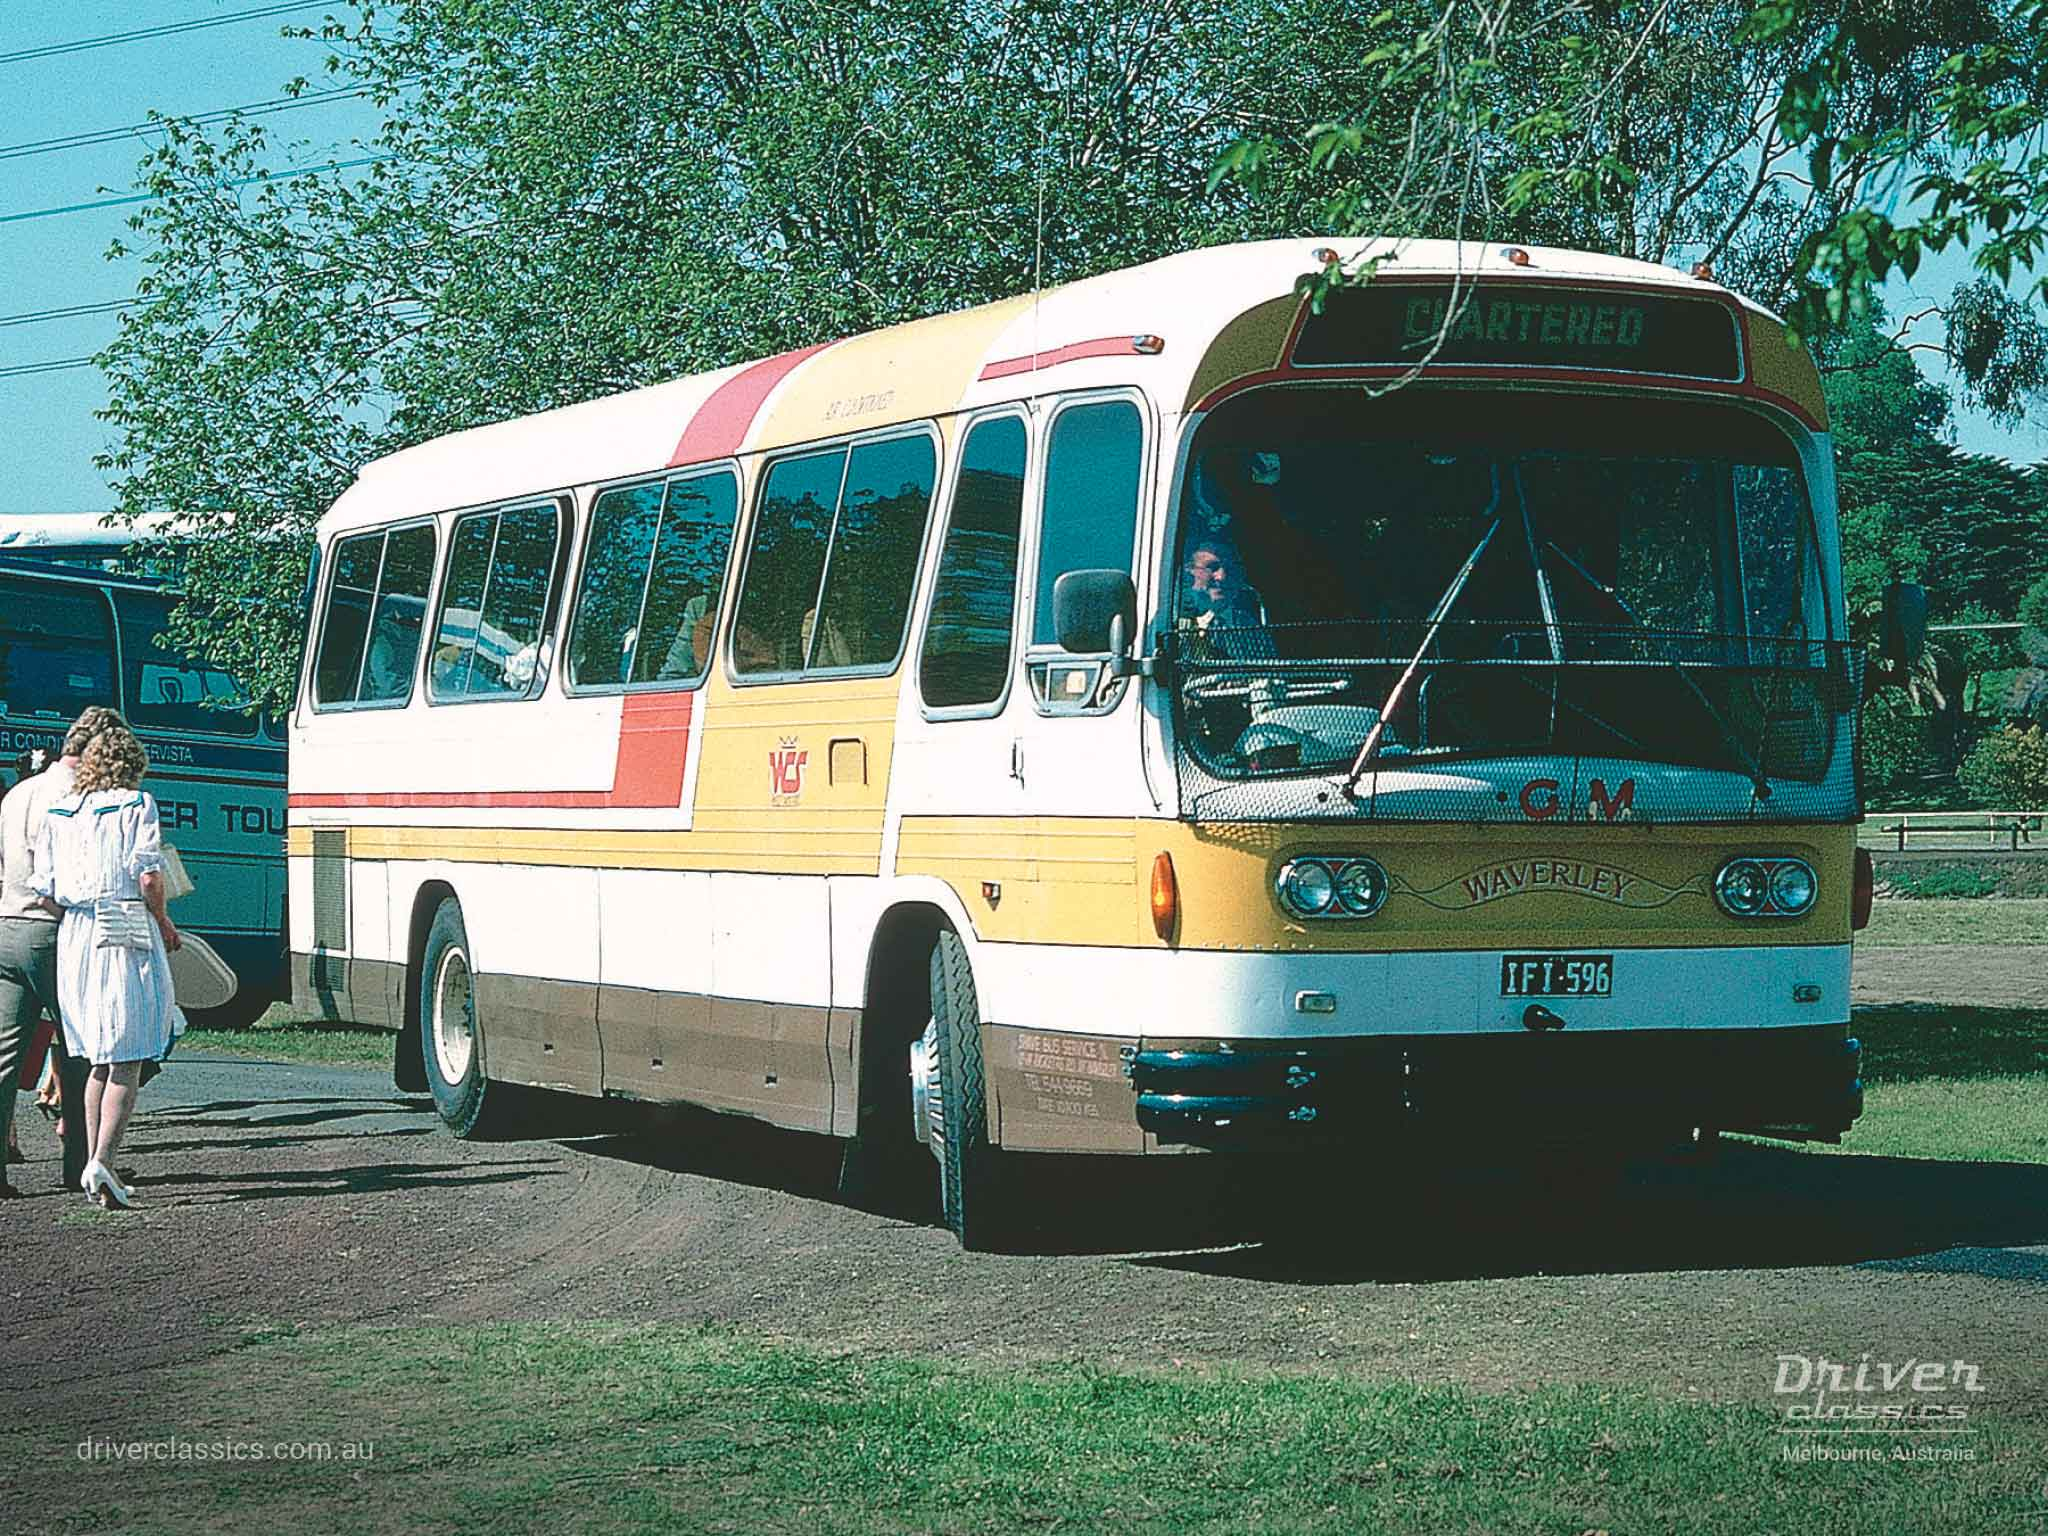 Ansair Scenicruiser bus, Reo 1965 version, in Shave Bus Service colours. Photo taken Melbourne 1986